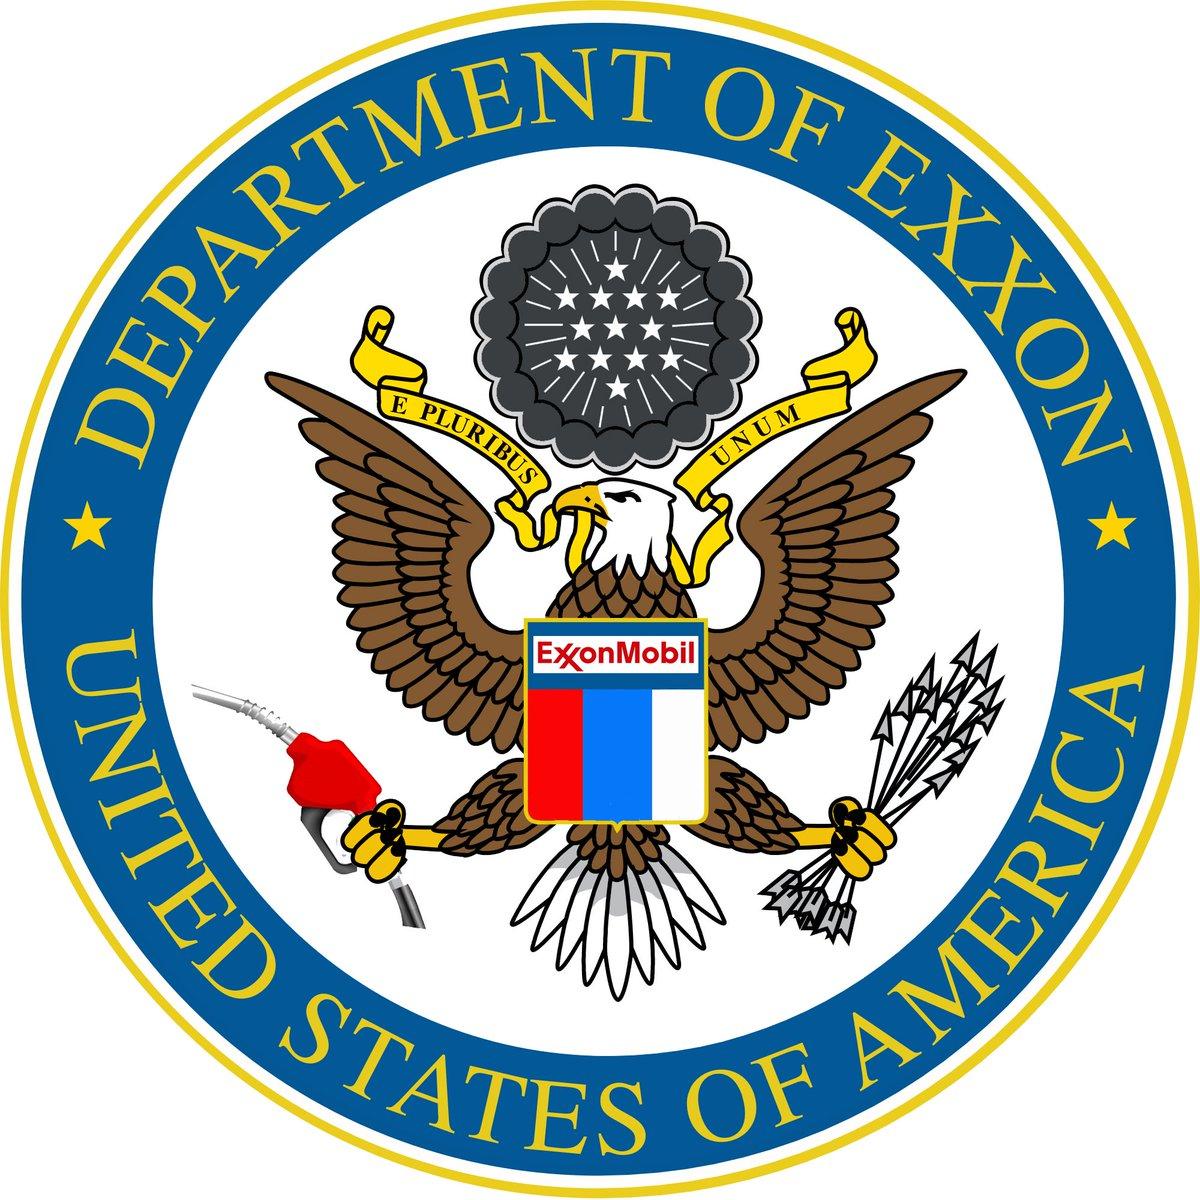 .@exxonmobil&#39;s man at @StateDept just canned a bunch of civil servants. Regime change!  http://www. cbsnews.com/news/state-dep t-layoffs-under-rex-tillerson-being-carried-out/ &nbsp; …  #ExxonKnew #Kleptocracy<br>http://pic.twitter.com/QSRNREiW9Q